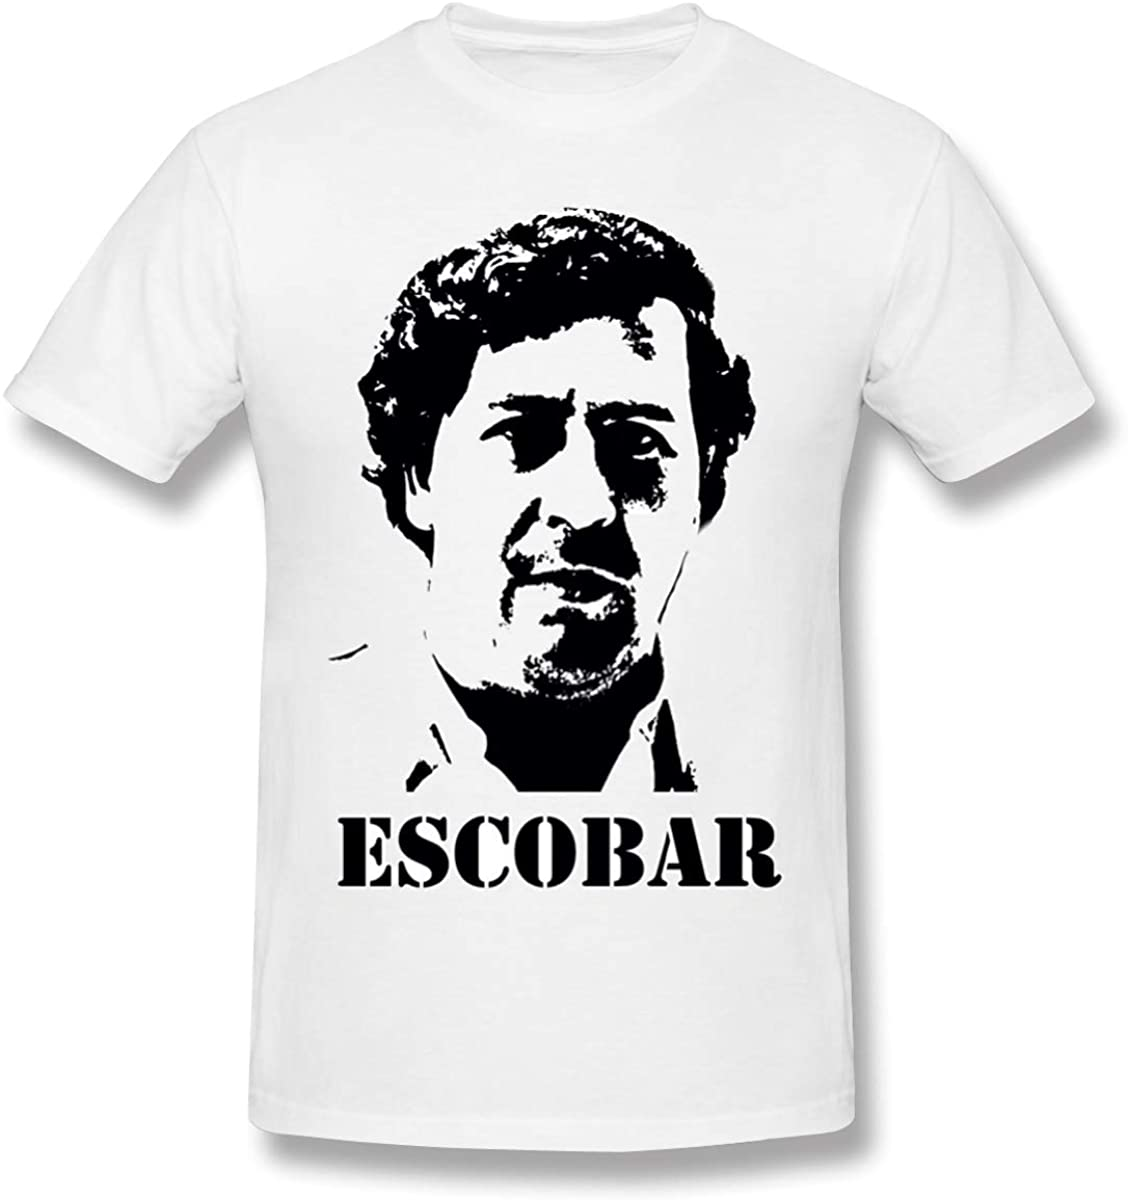 Pablo Escobar Men's Comfortable, Stylish, Avant-Garde, Basic Short Sleeve T-Shirt